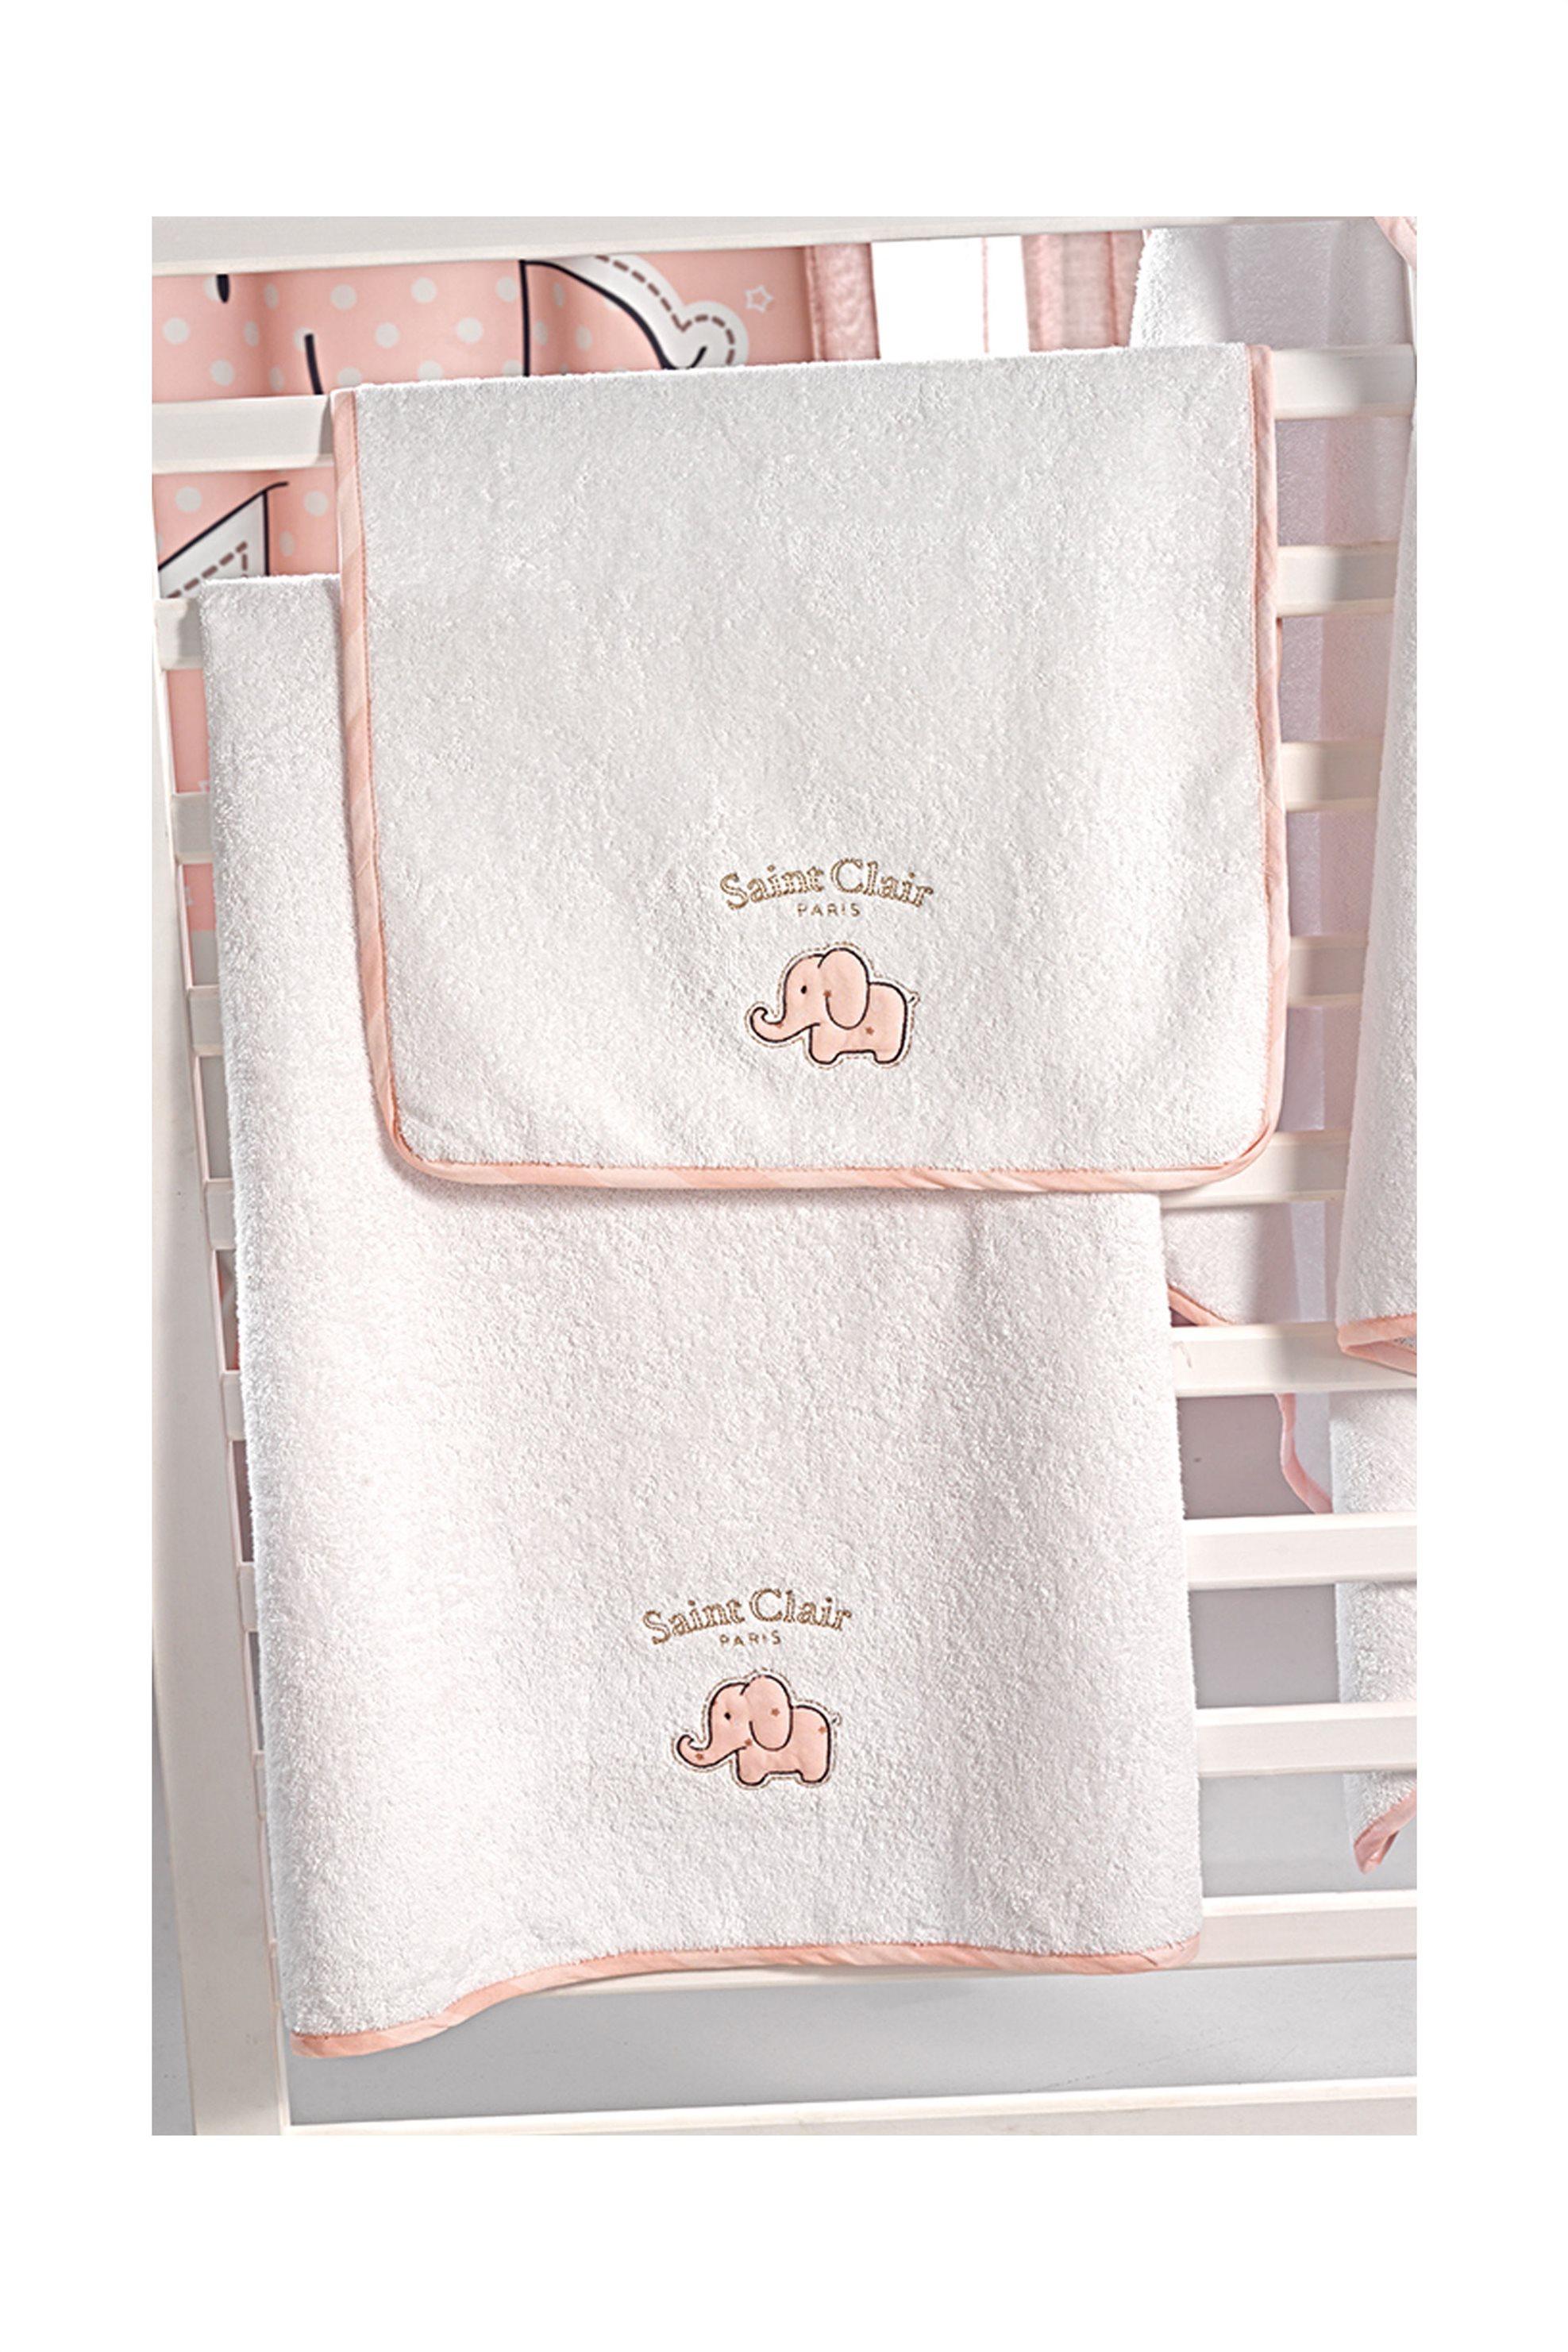 Saint Clair Paris σετ πετσέτες Africa Pink (2 τεμάχια) - 1722090215000 - Ροζ home   παιδια   πετσέτες   σετ παιδικές πετσέτες